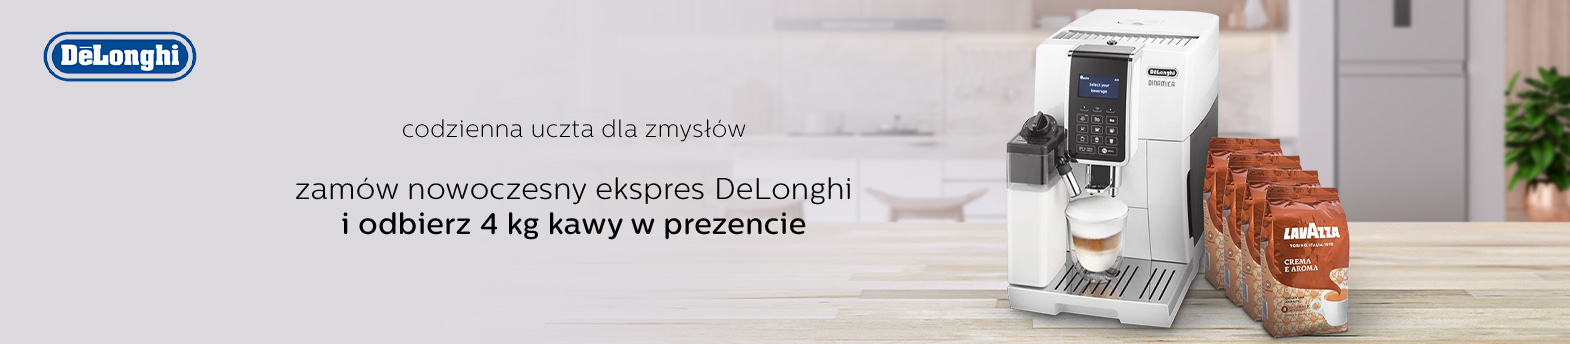 DeLonghi - 4 kg kawy gratis